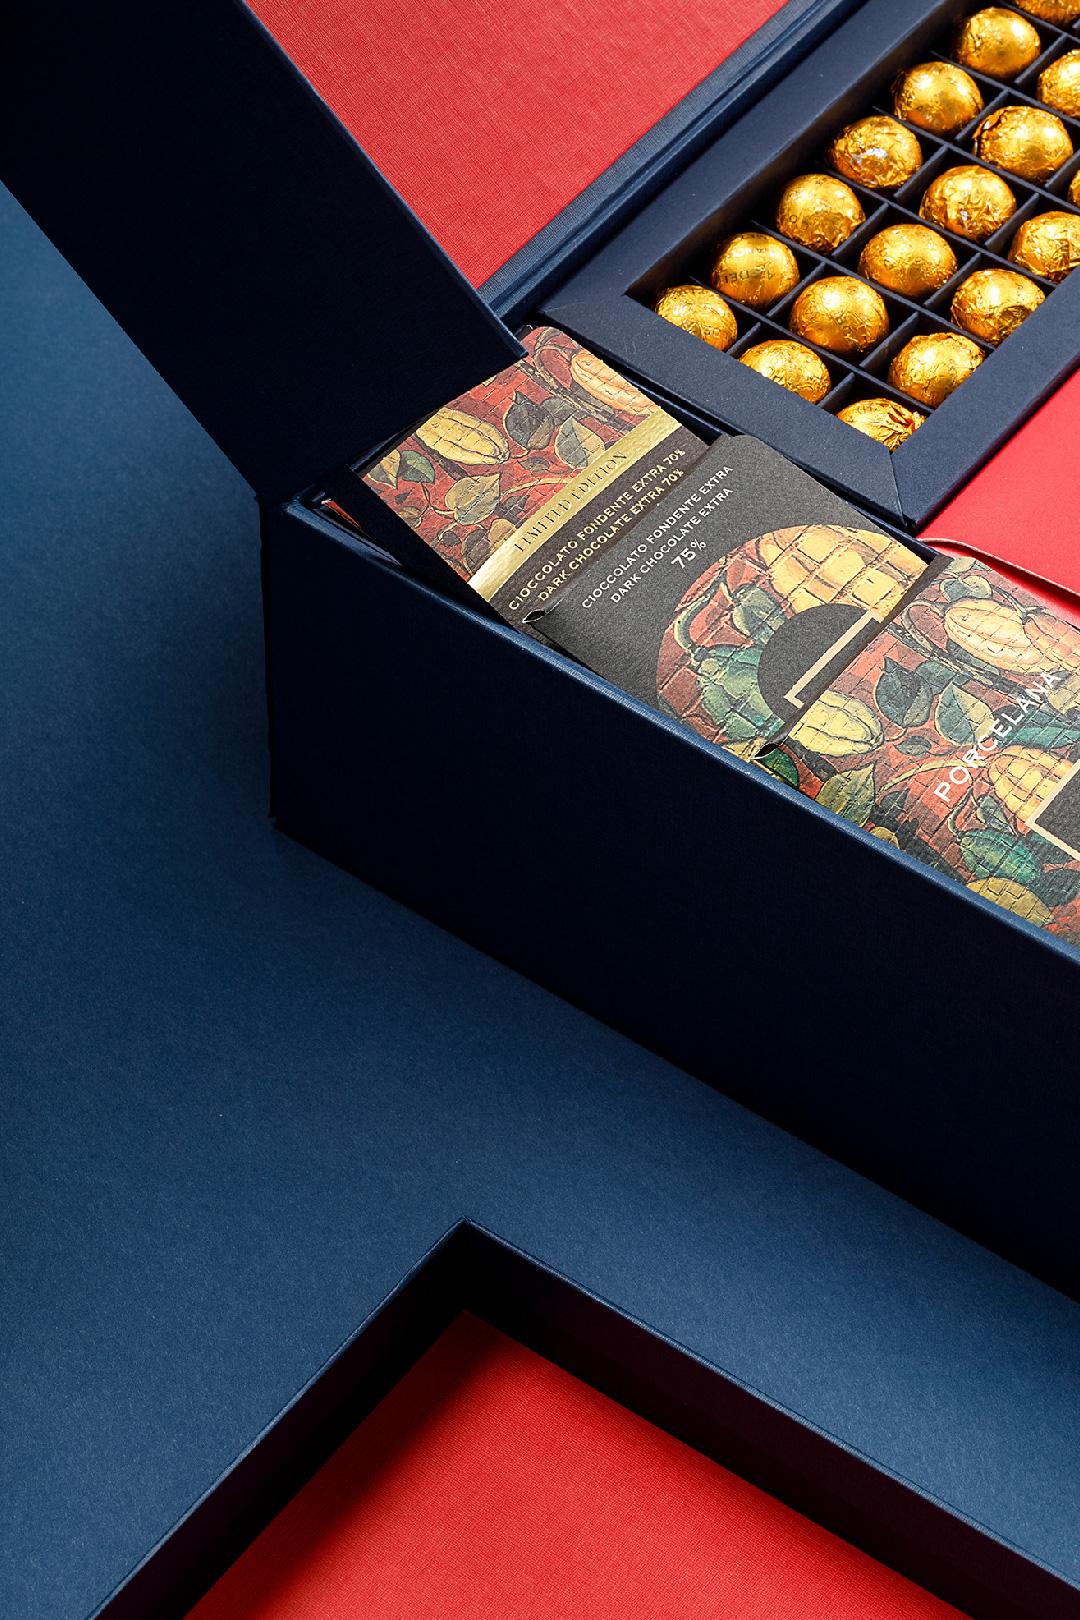 Amedei tuscany drogheria studio chocolate design packagin graphic design cioccolato food design natale christmas xmas